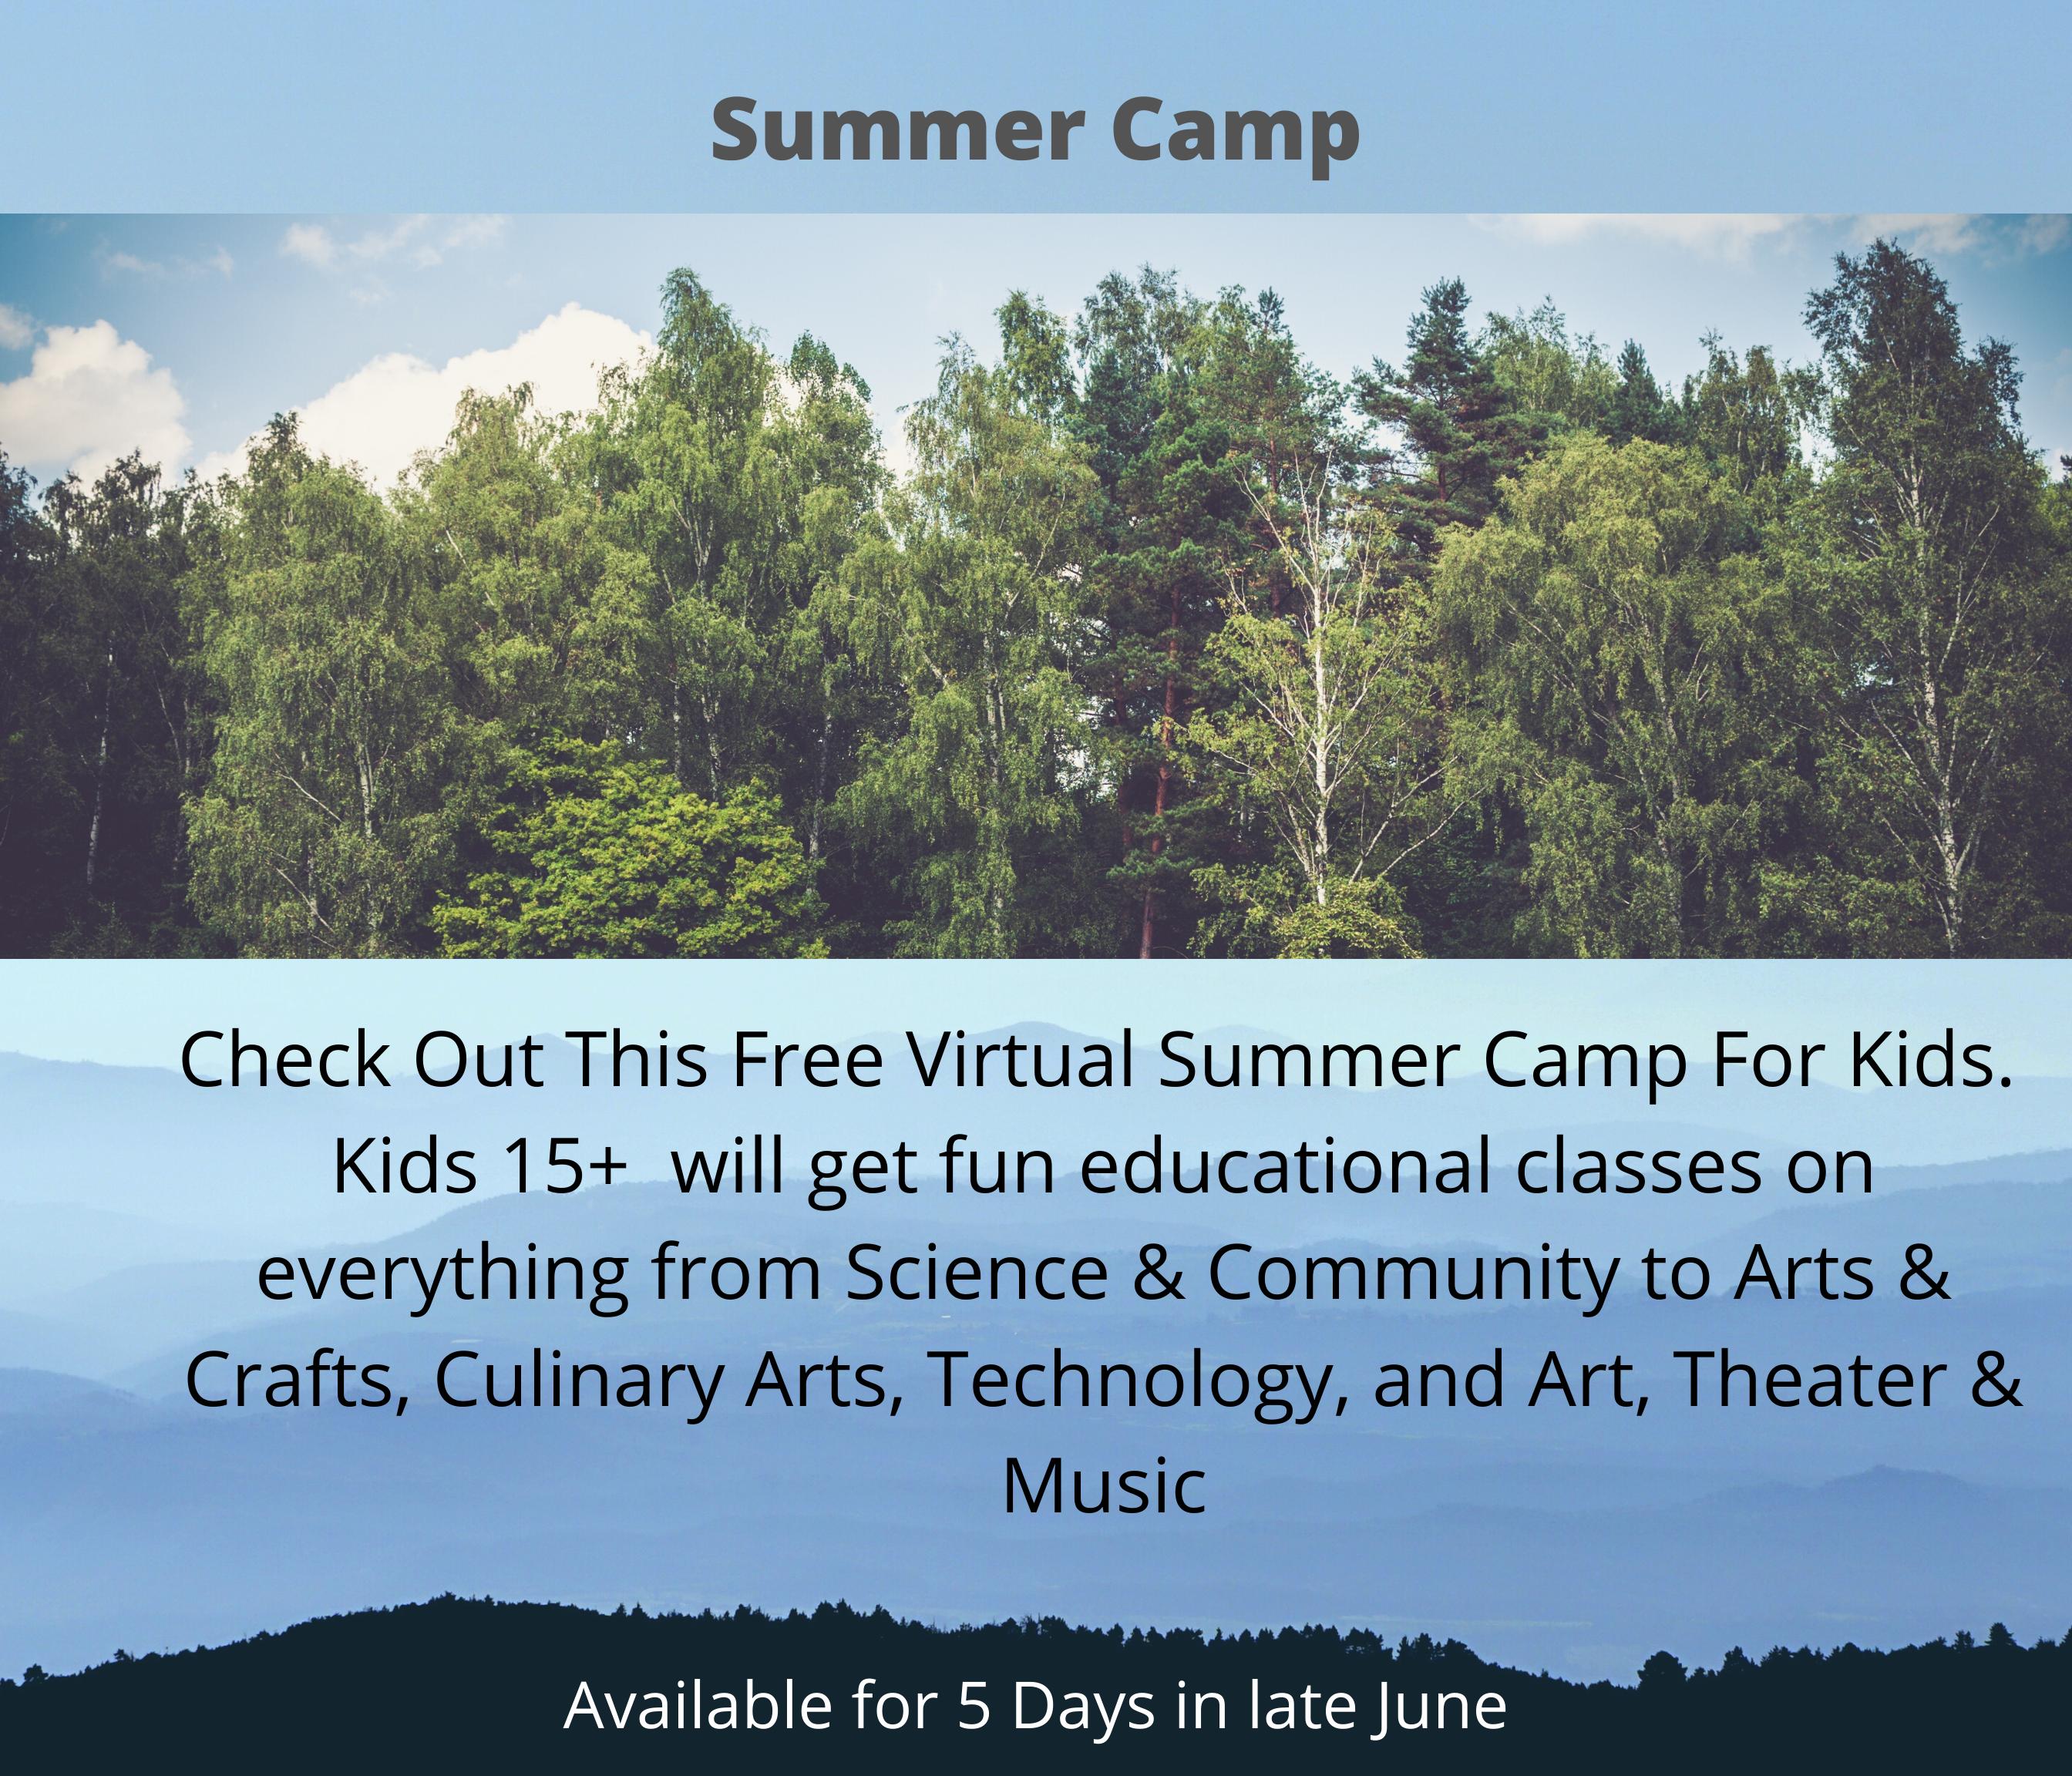 Copy of Copy of Copy of Copy of Copy of Copy of Summer Camp